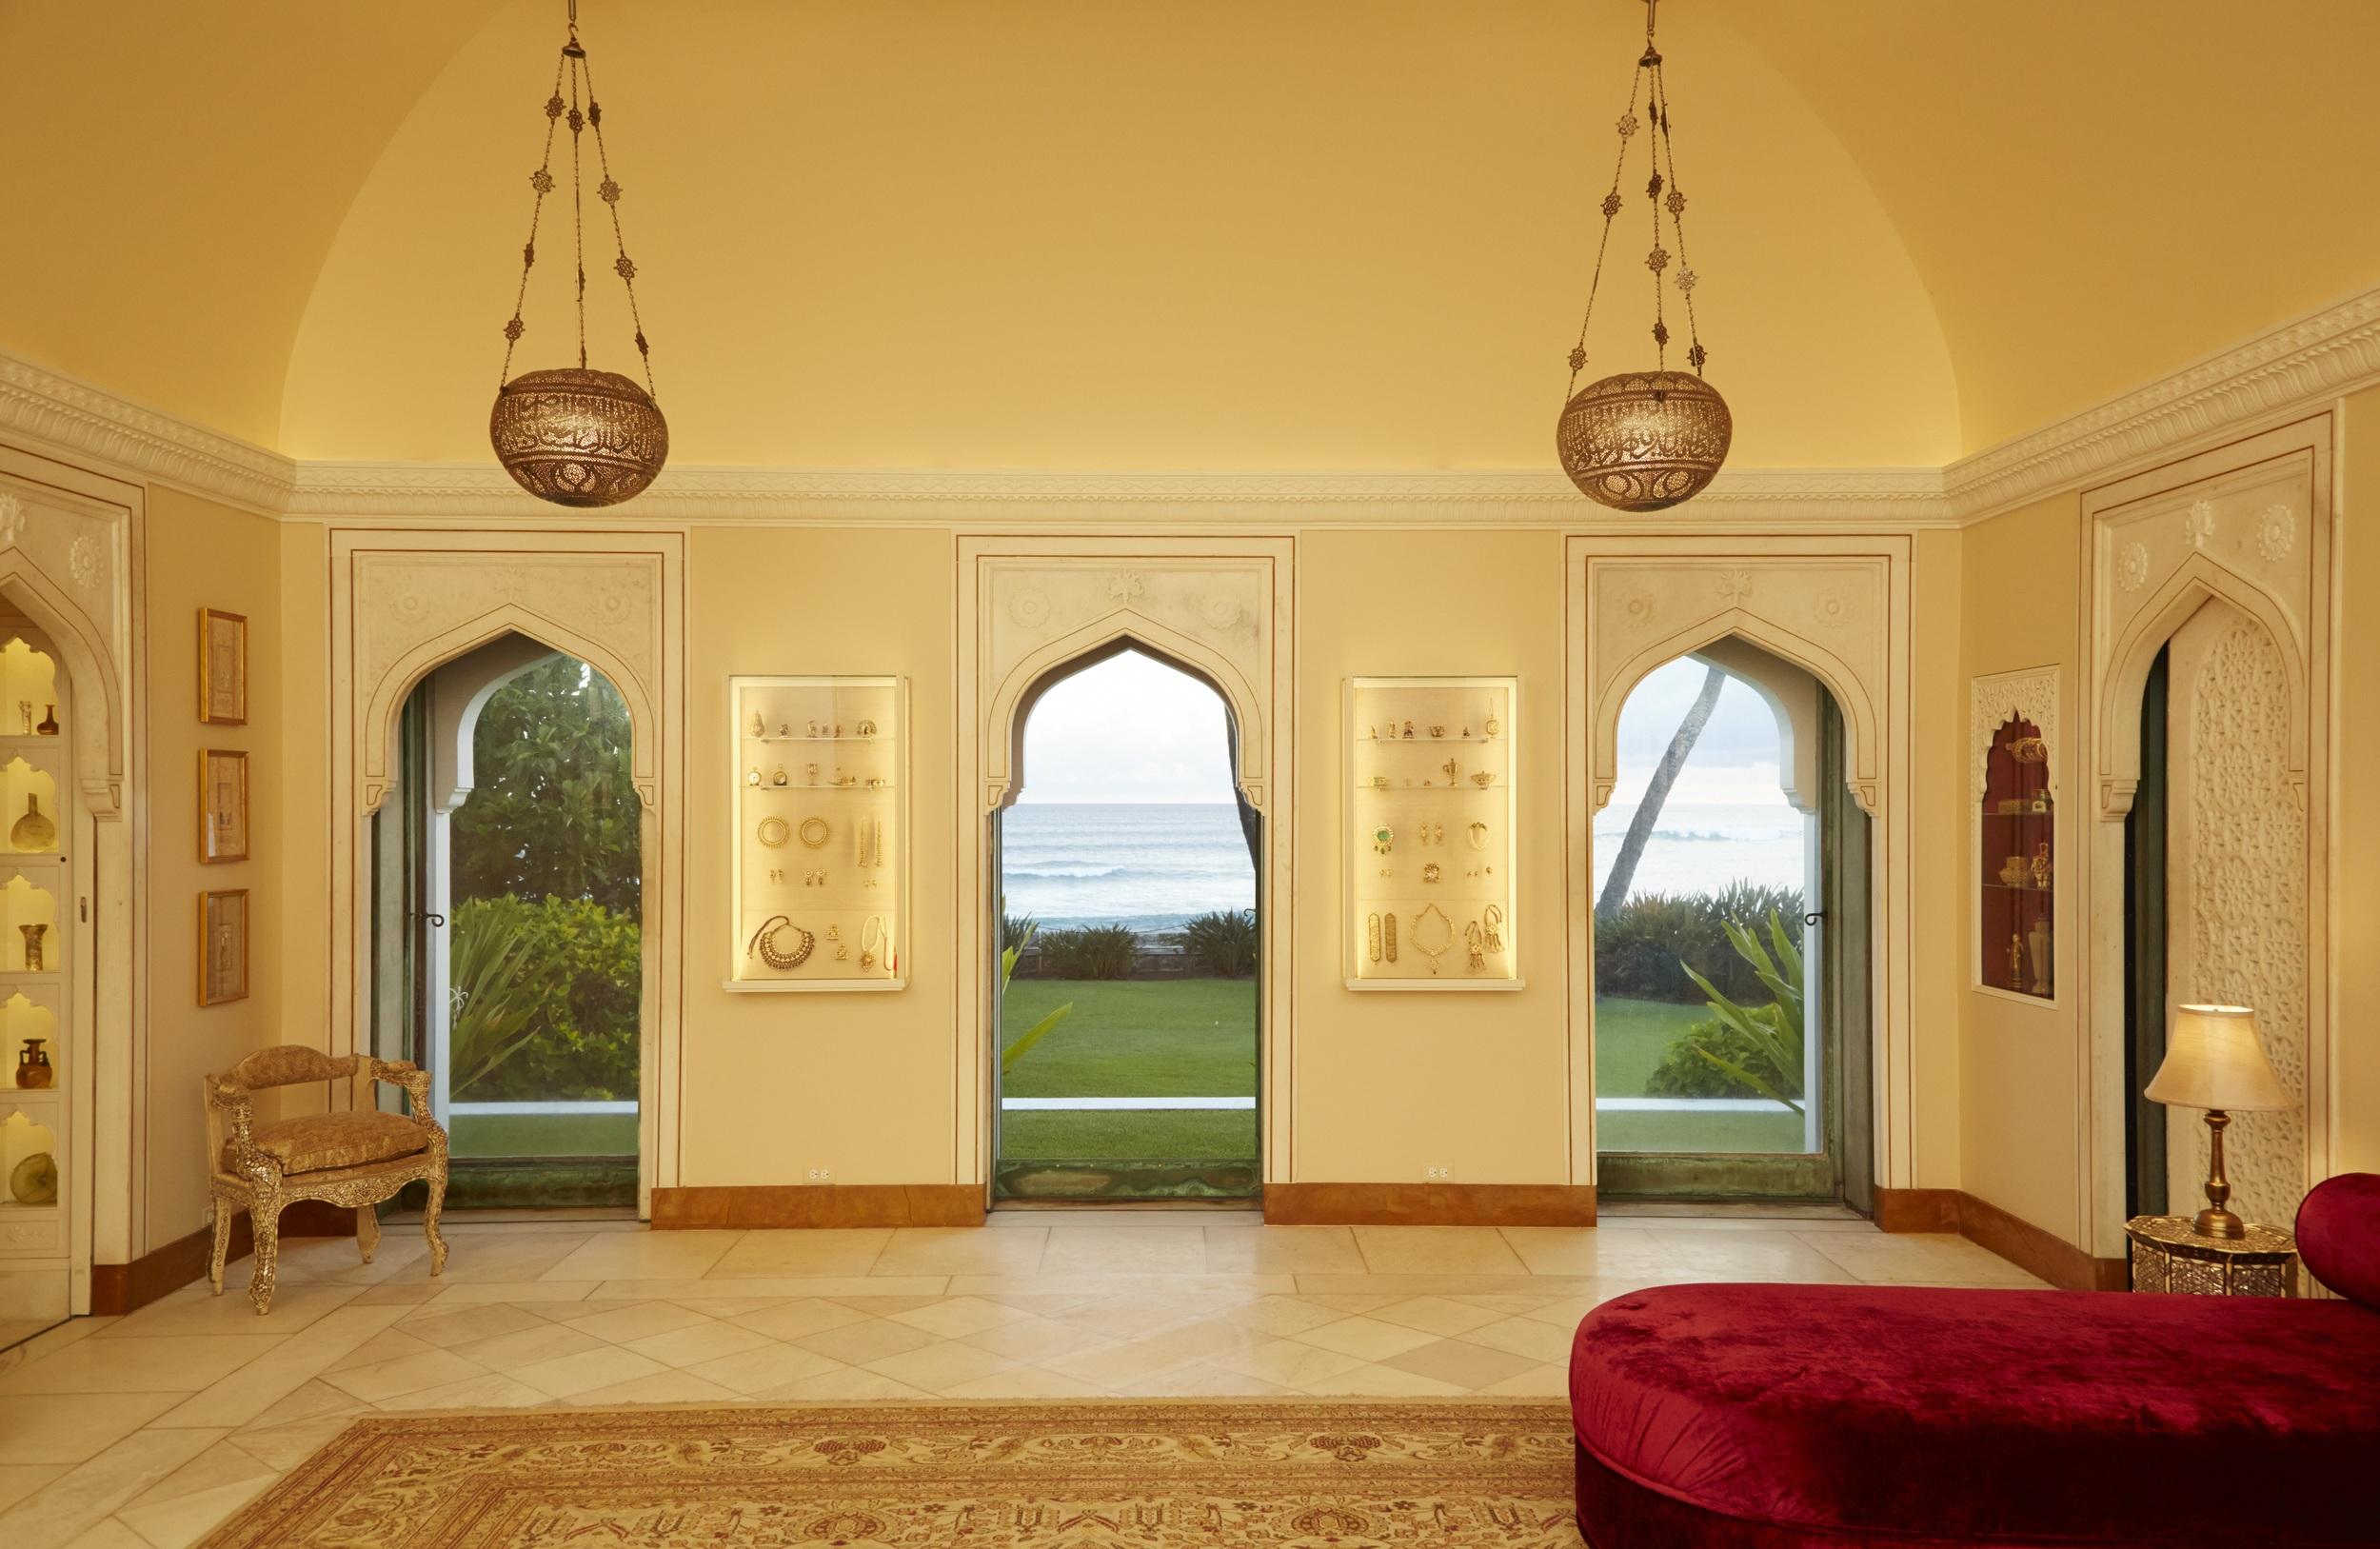 Mughal Suite bedroom after preservation work in 2014. © 2014, Linny Morris, courtesy of the Doris Duke Foundation for Islamic Art, Honolulu, Hawai'i.